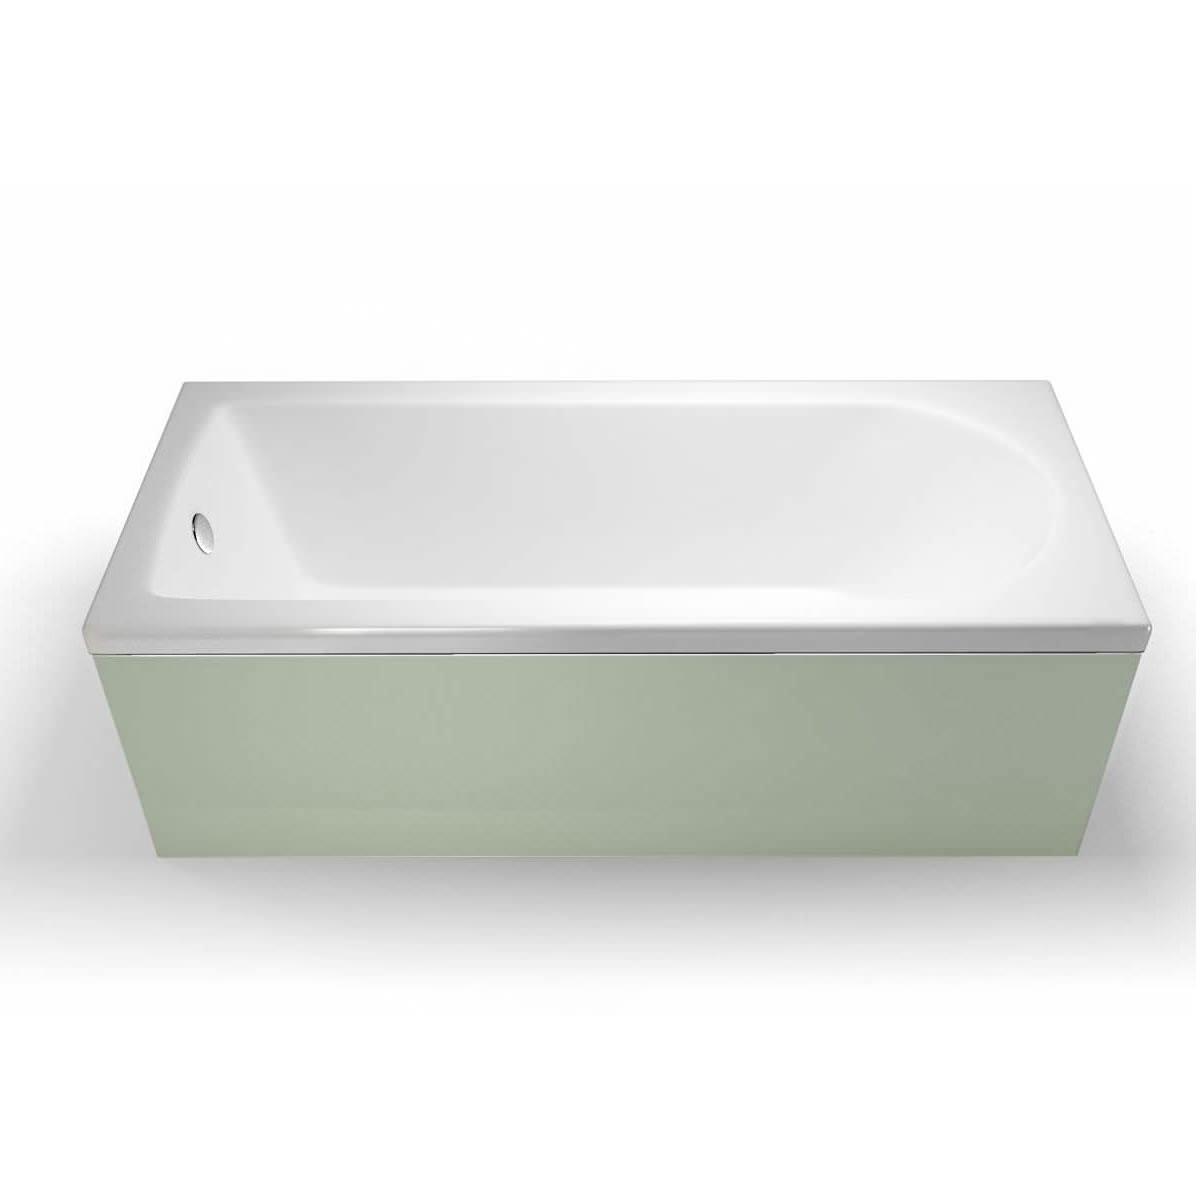 regular baths britton cleargreen reuse 1700 x 700mm single ended bath